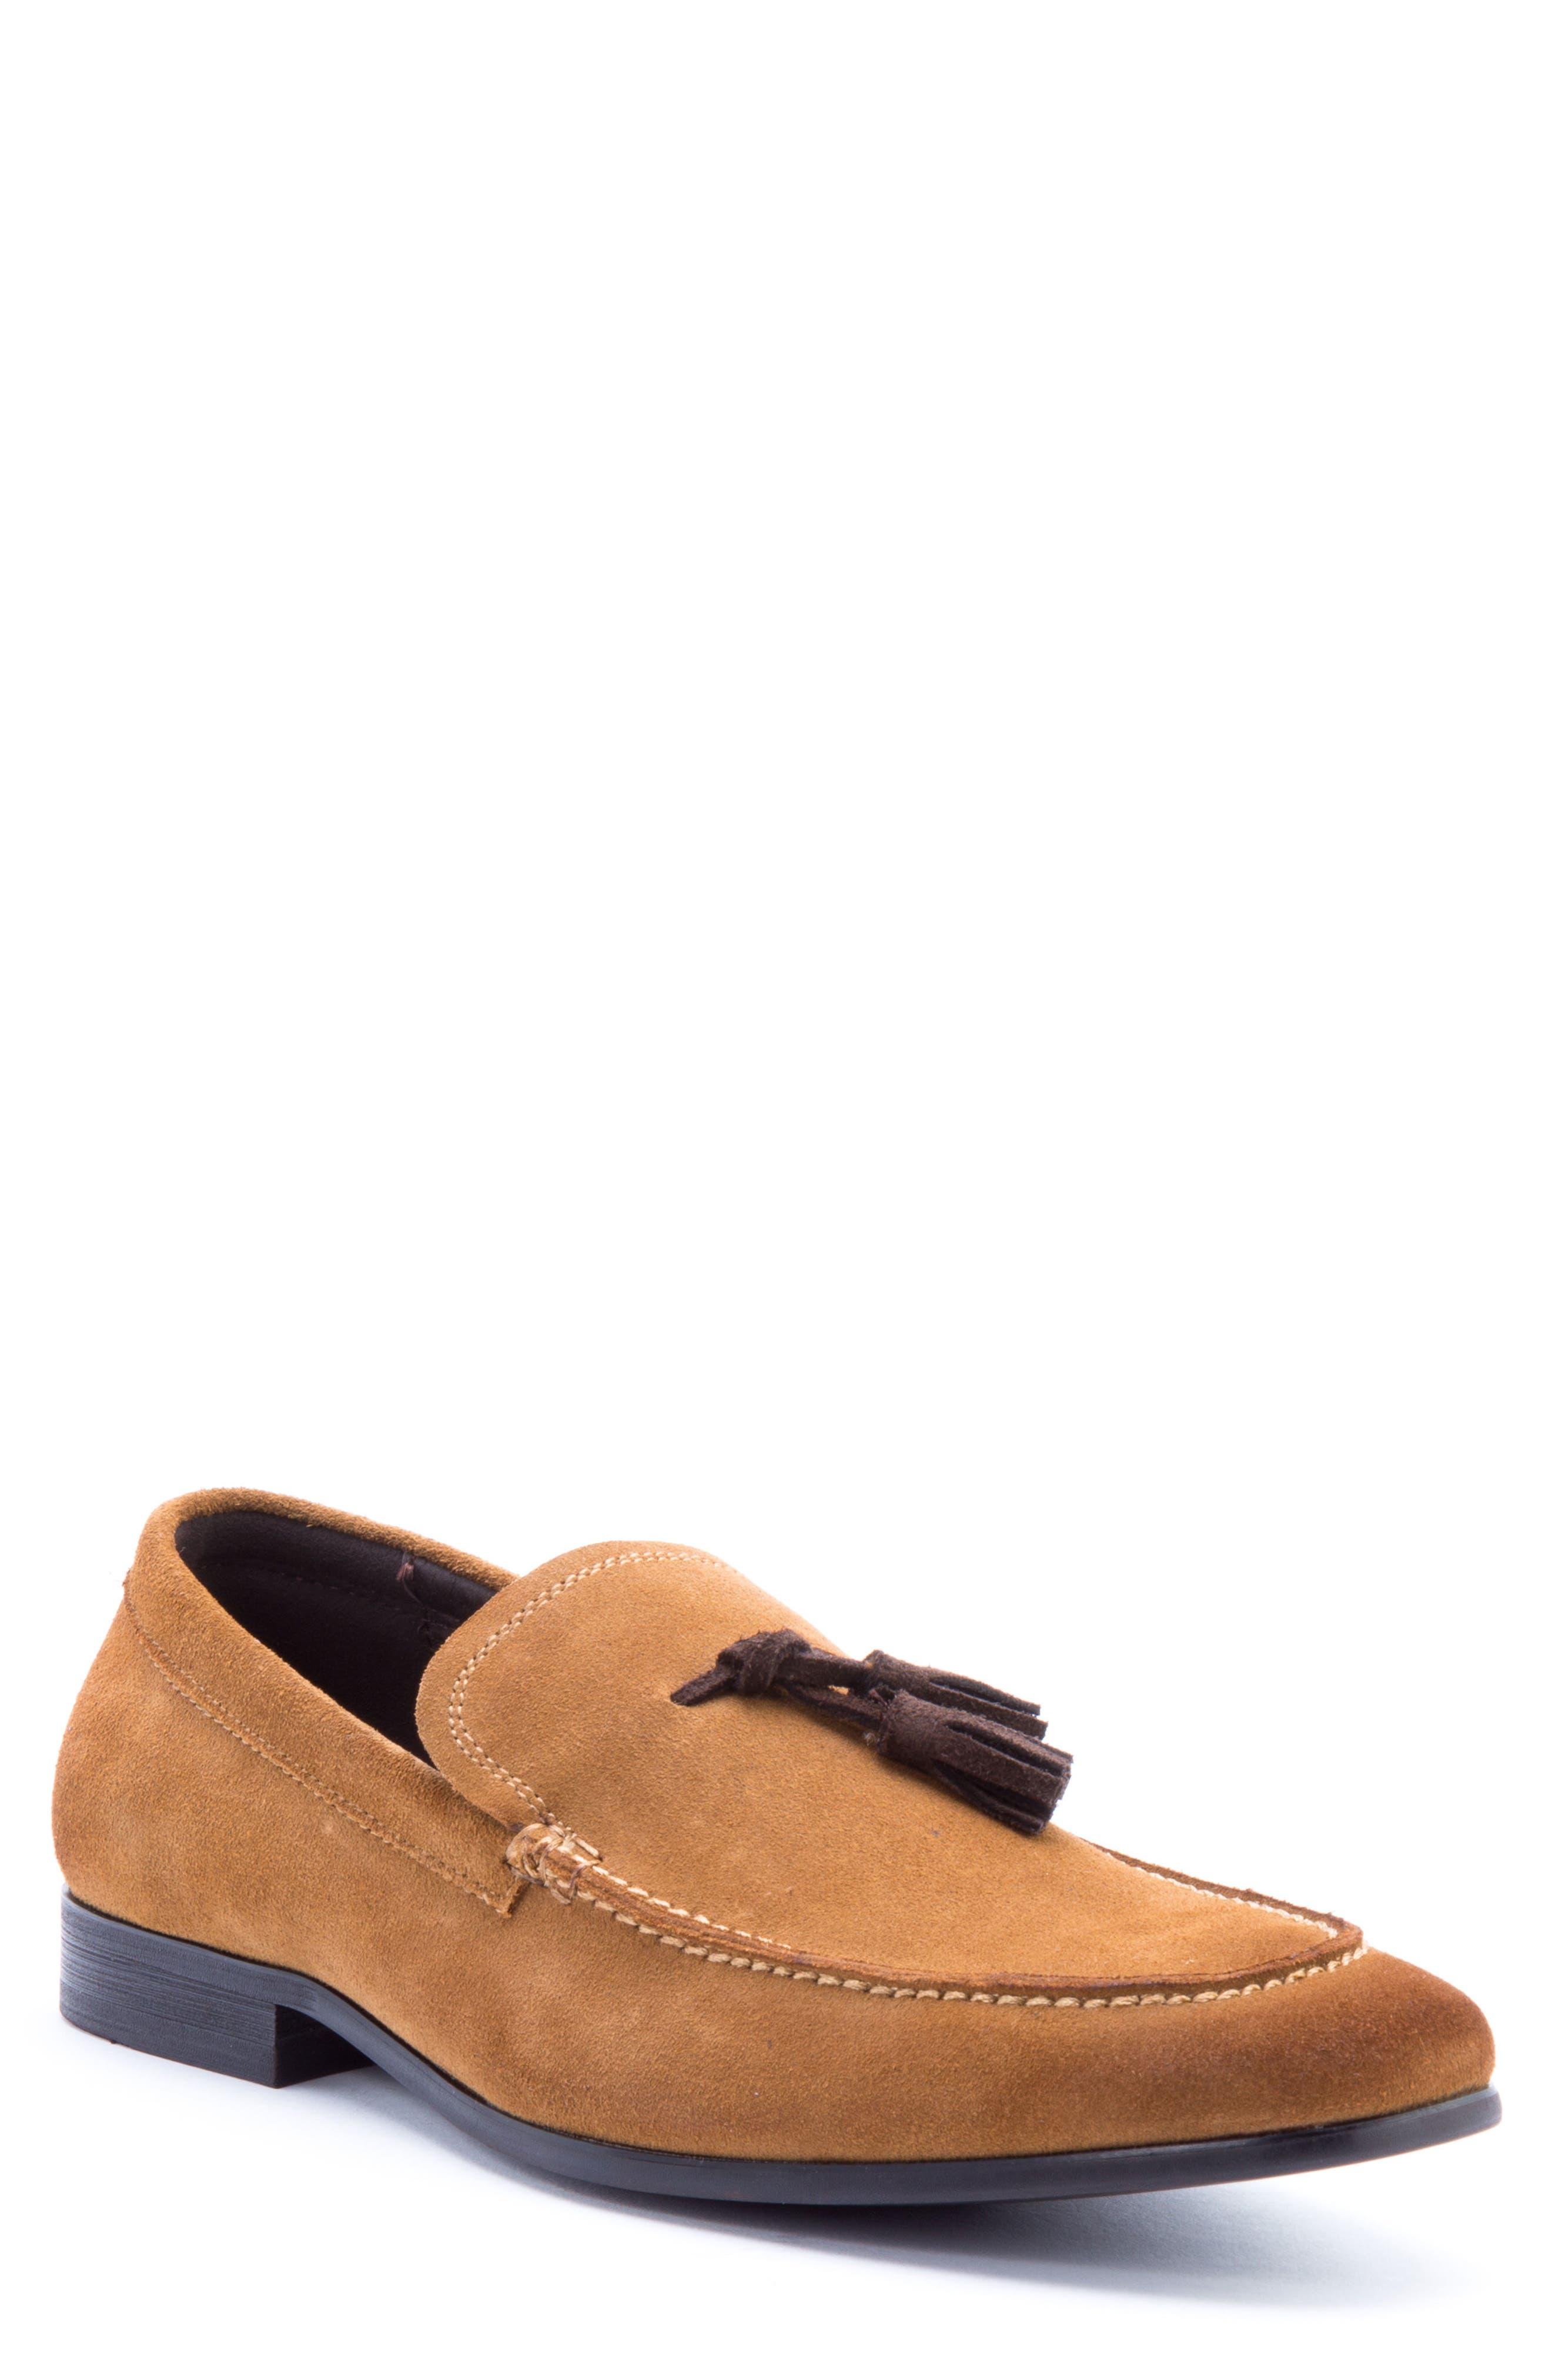 Severn Tassel Venetian Loafer,                         Main,                         color, COGNAC SUEDE